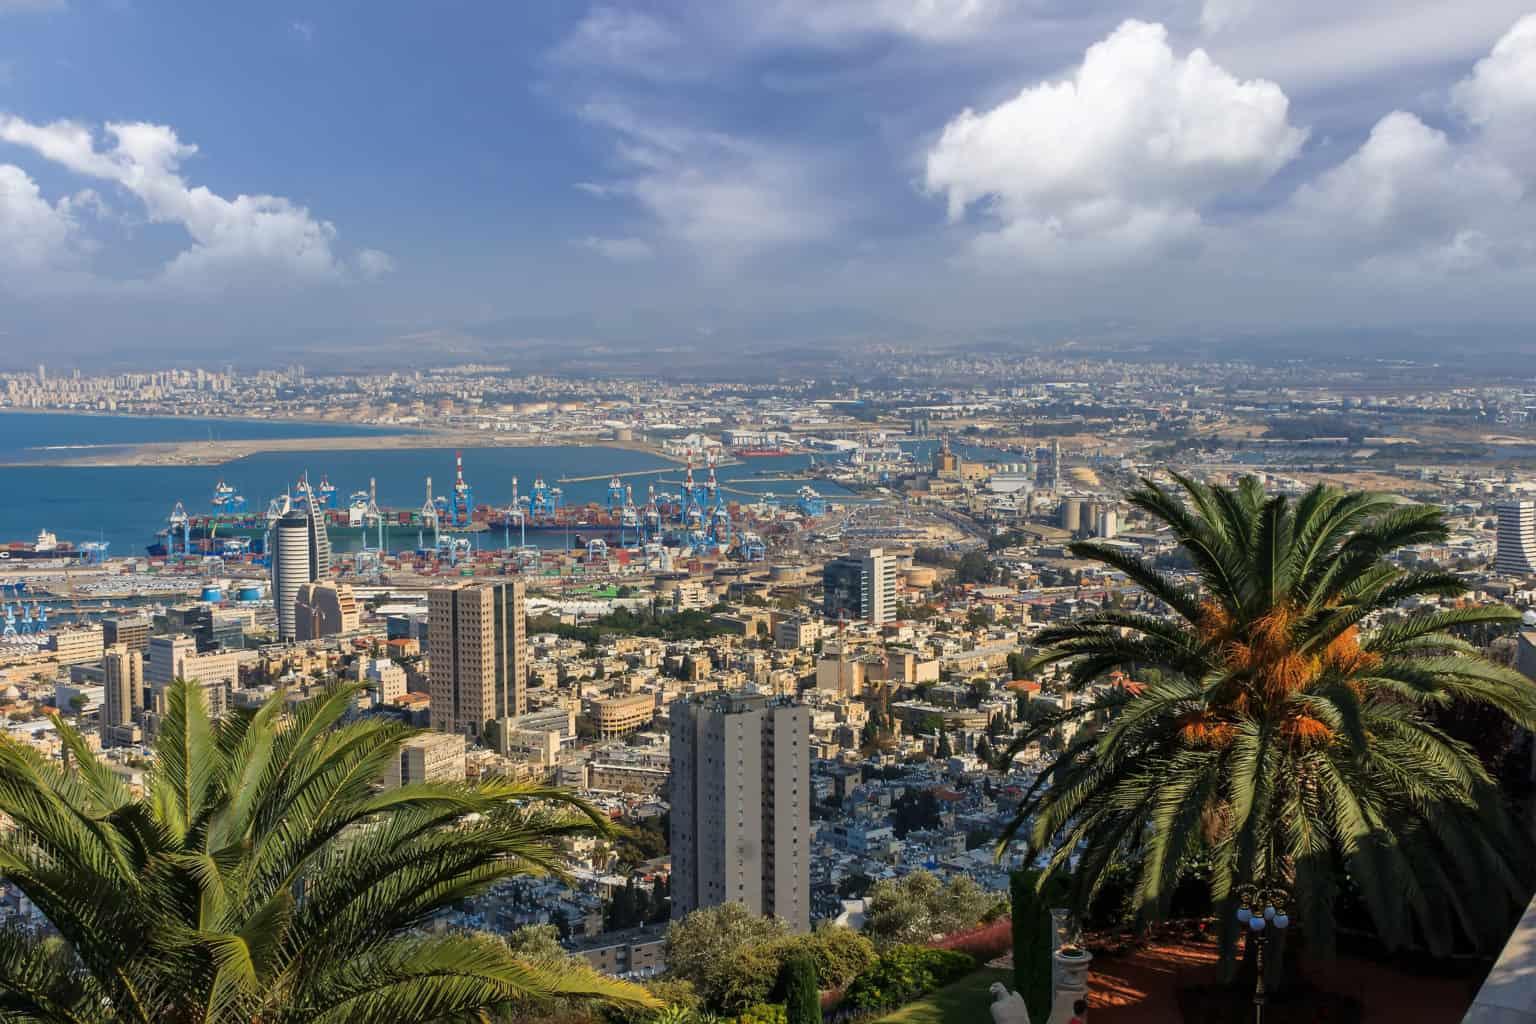 Walking tour in Haifa